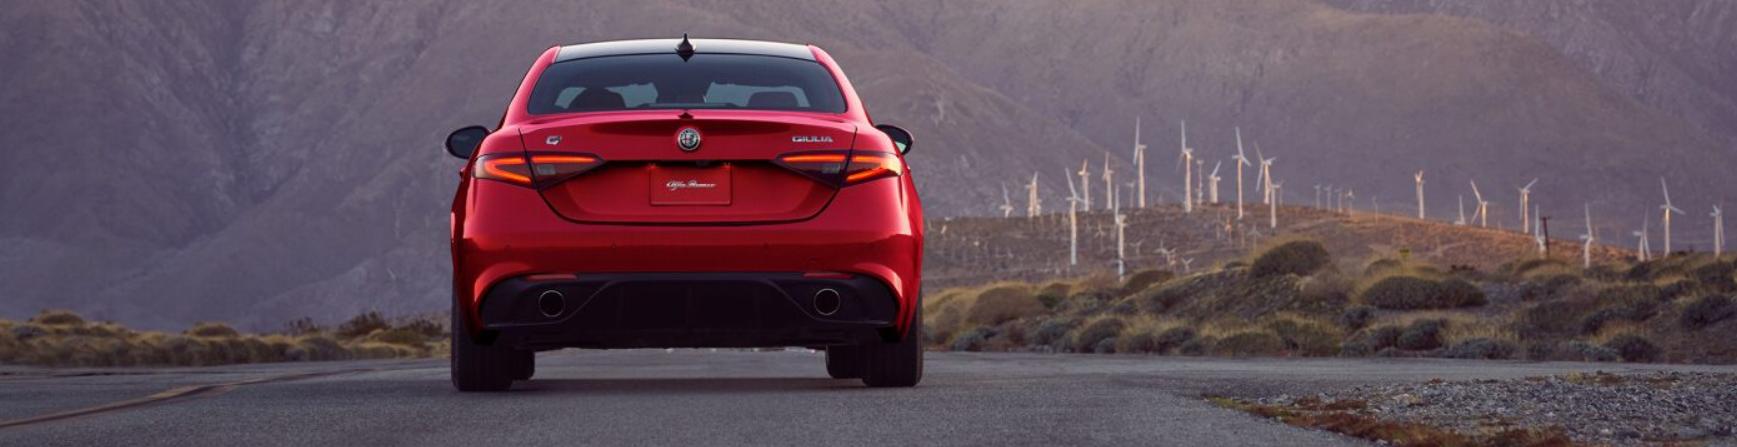 2020 Alfa Romeo Giulia | Exterior Design